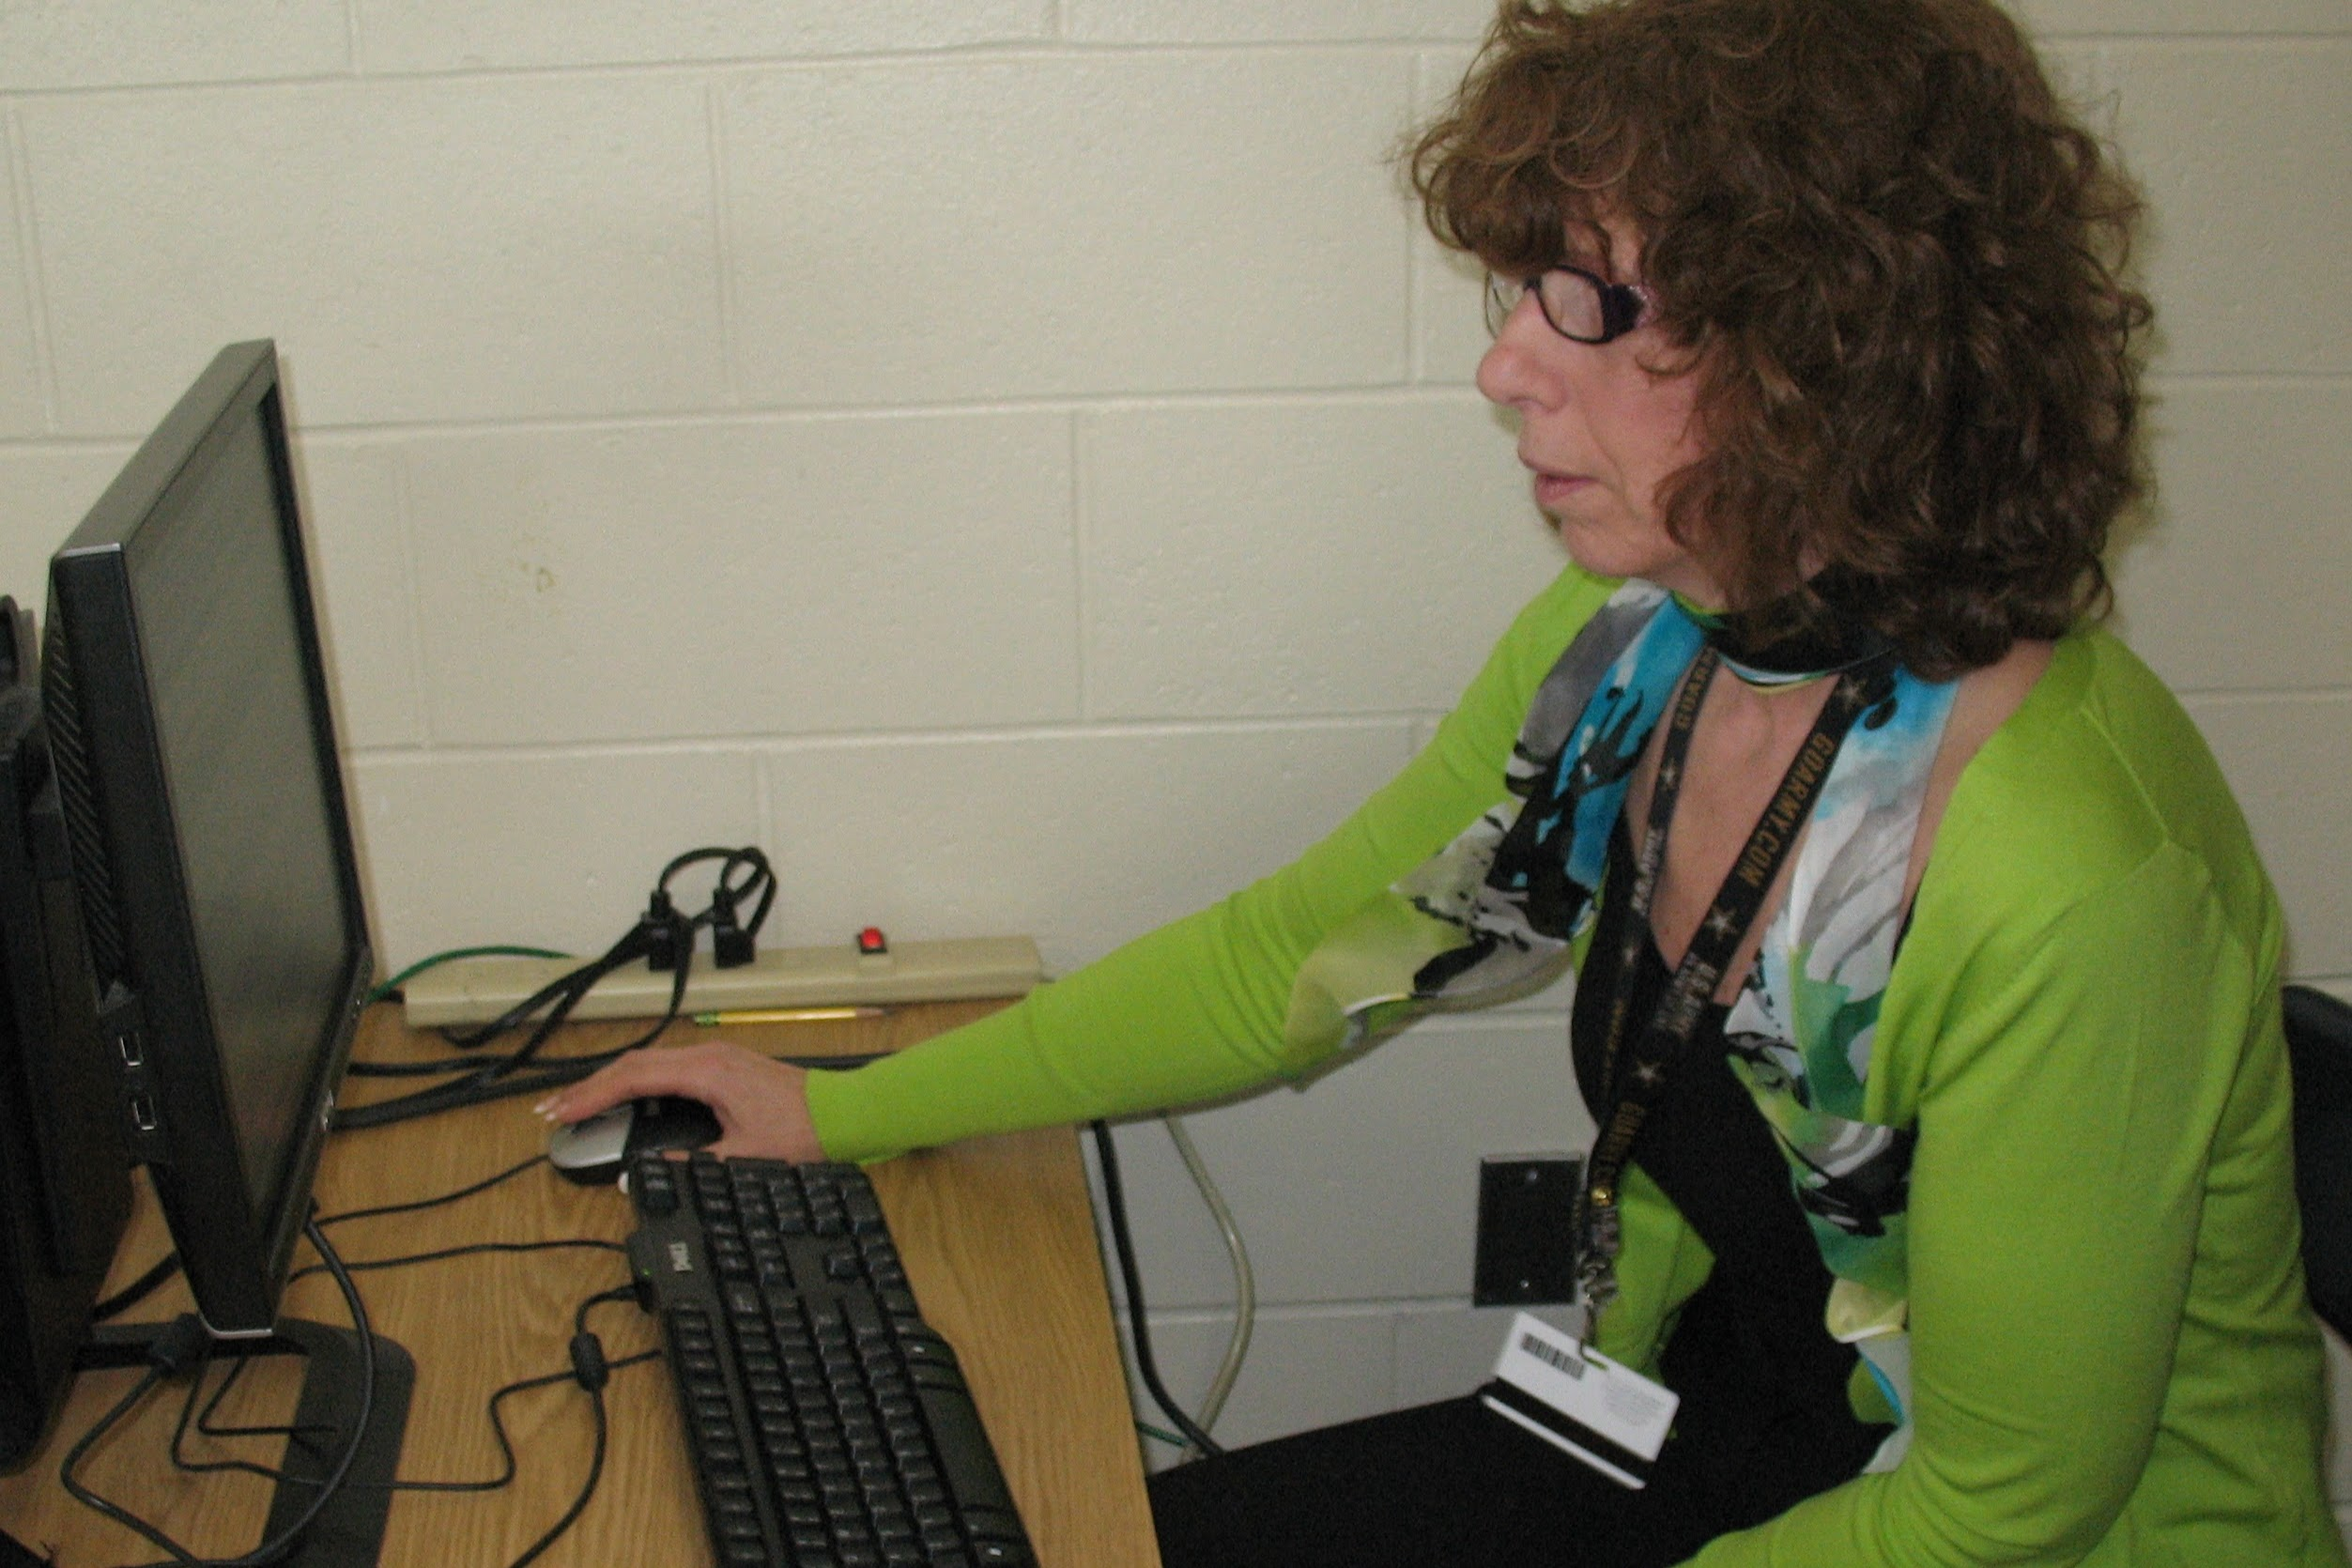 ASSISTments teacher at computer